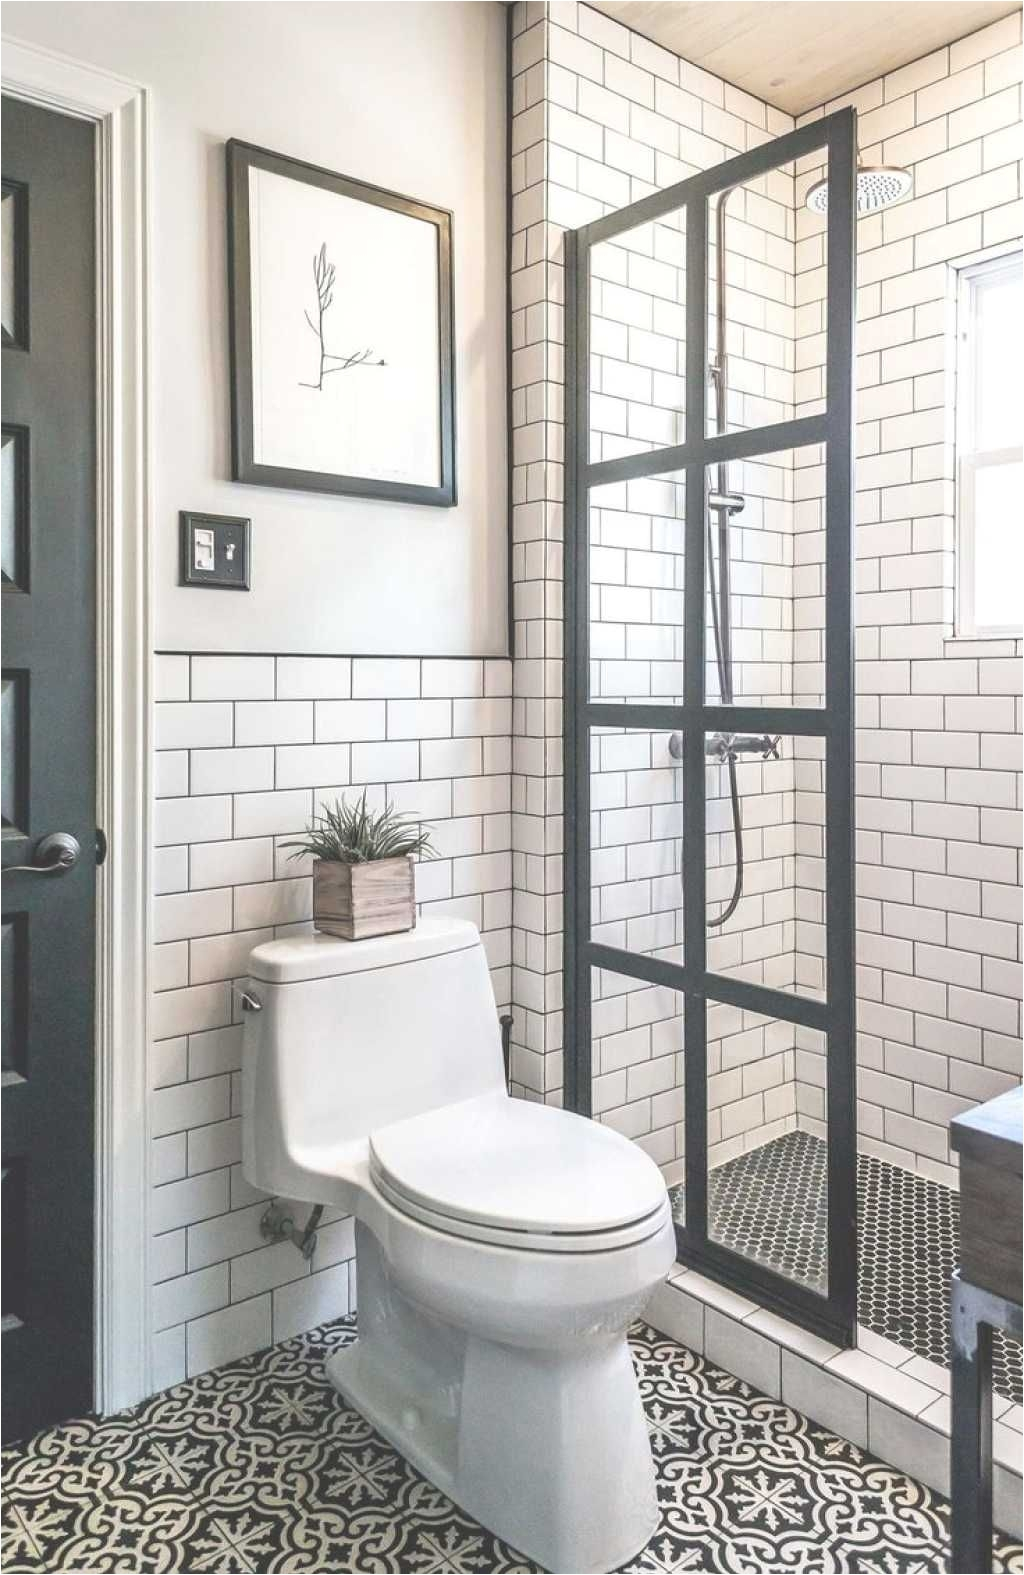 50 Small Master Bathroom Makeover Ideas A Bud zoladecor